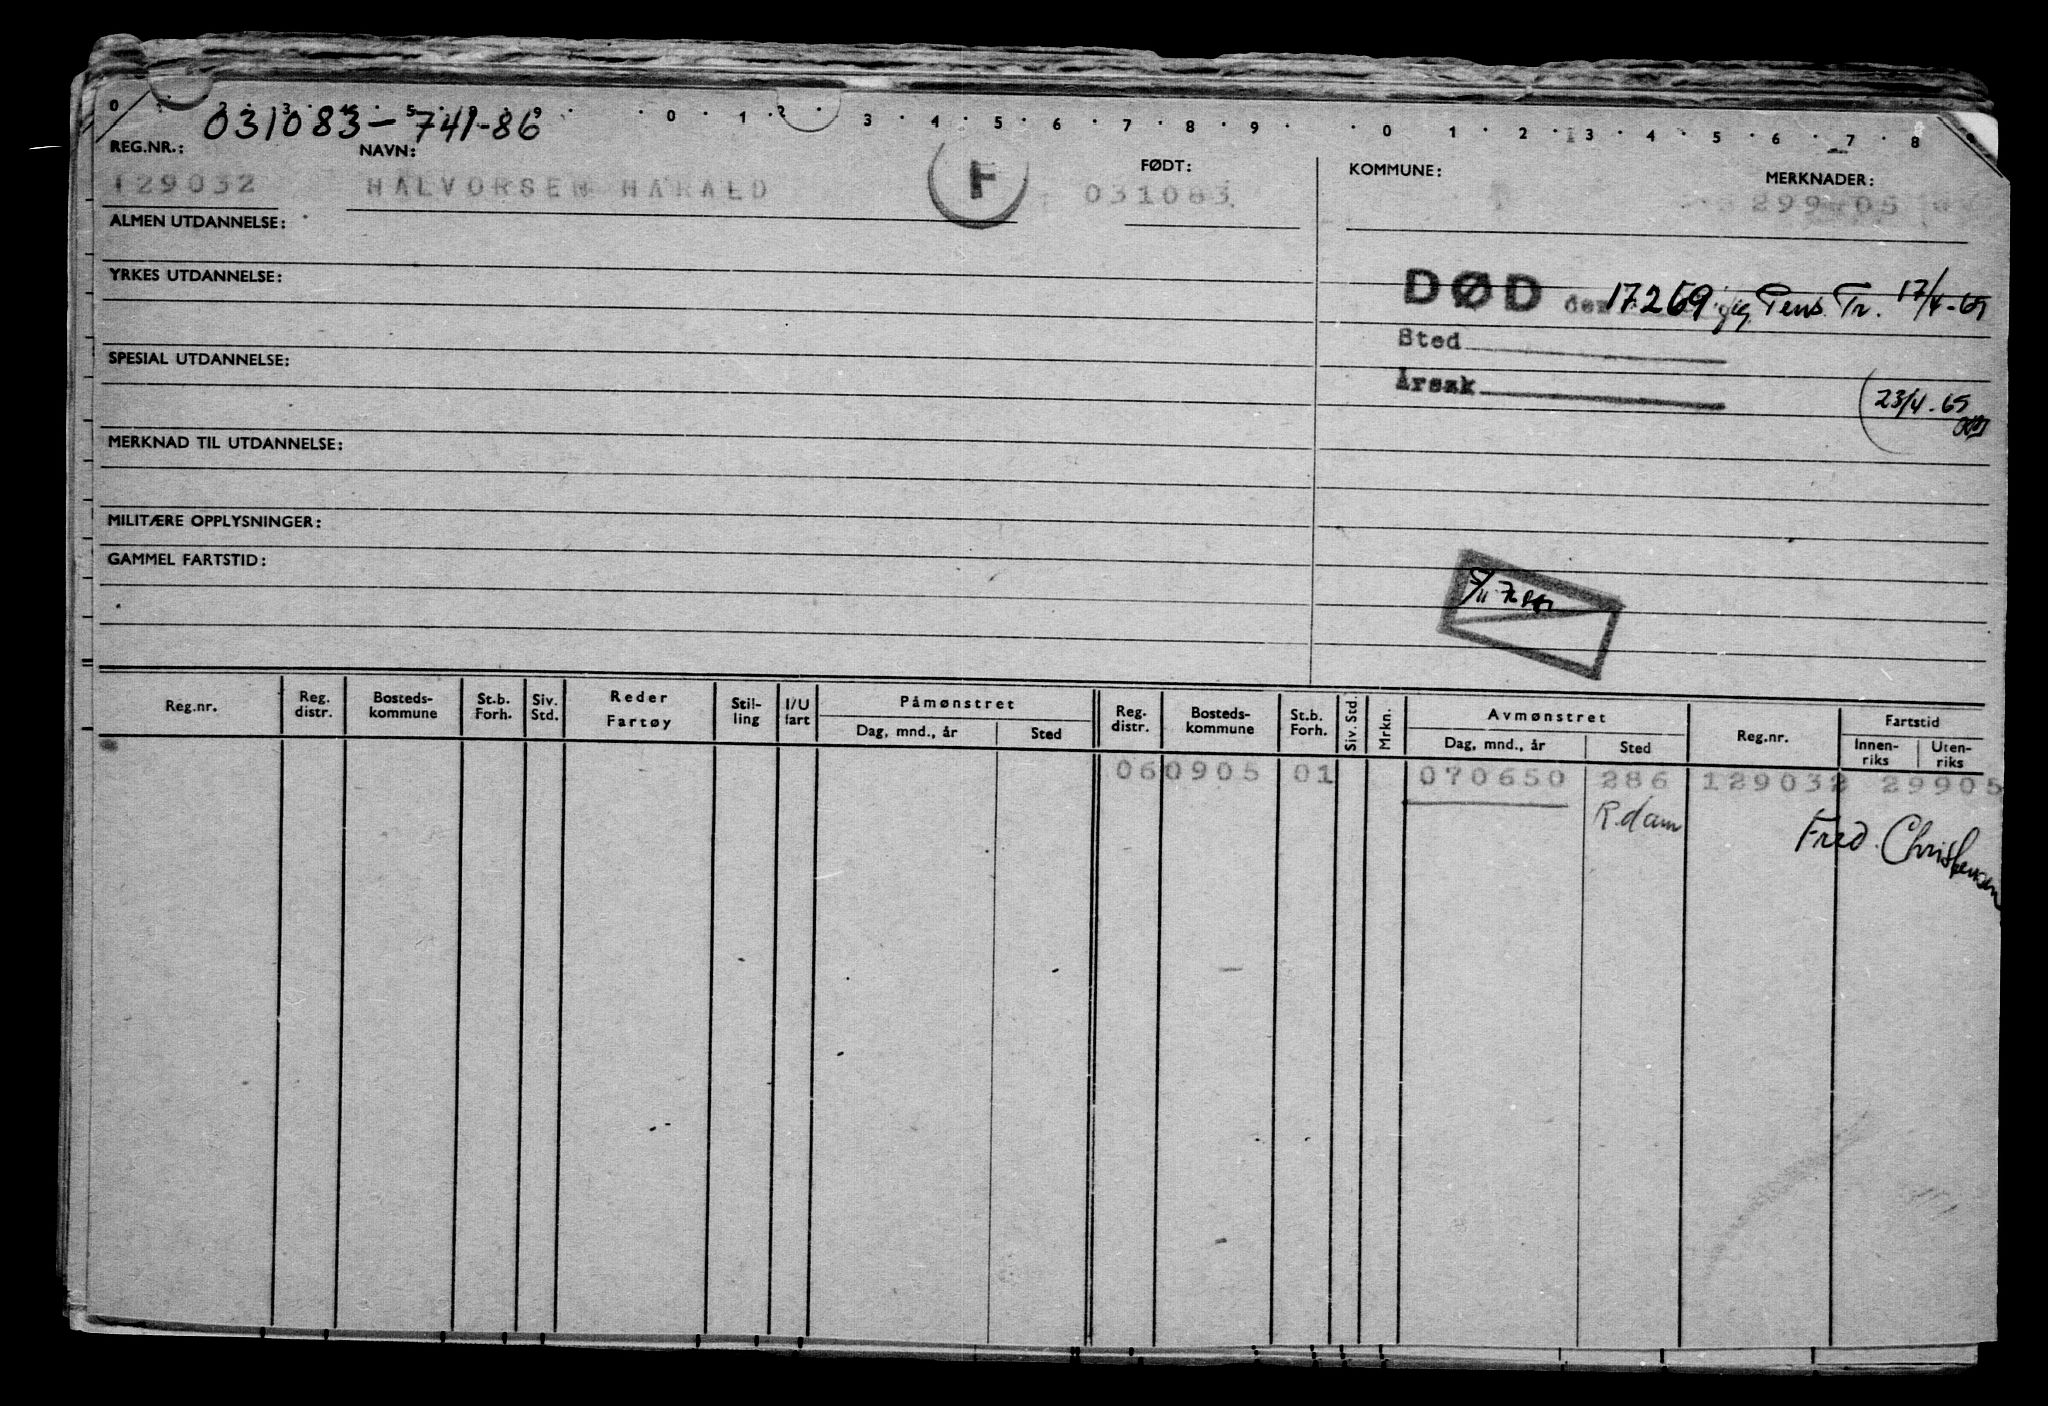 RA, Direktoratet for sjømenn, G/Gb/L0002: Hovedkort, 1883-1885, s. 117